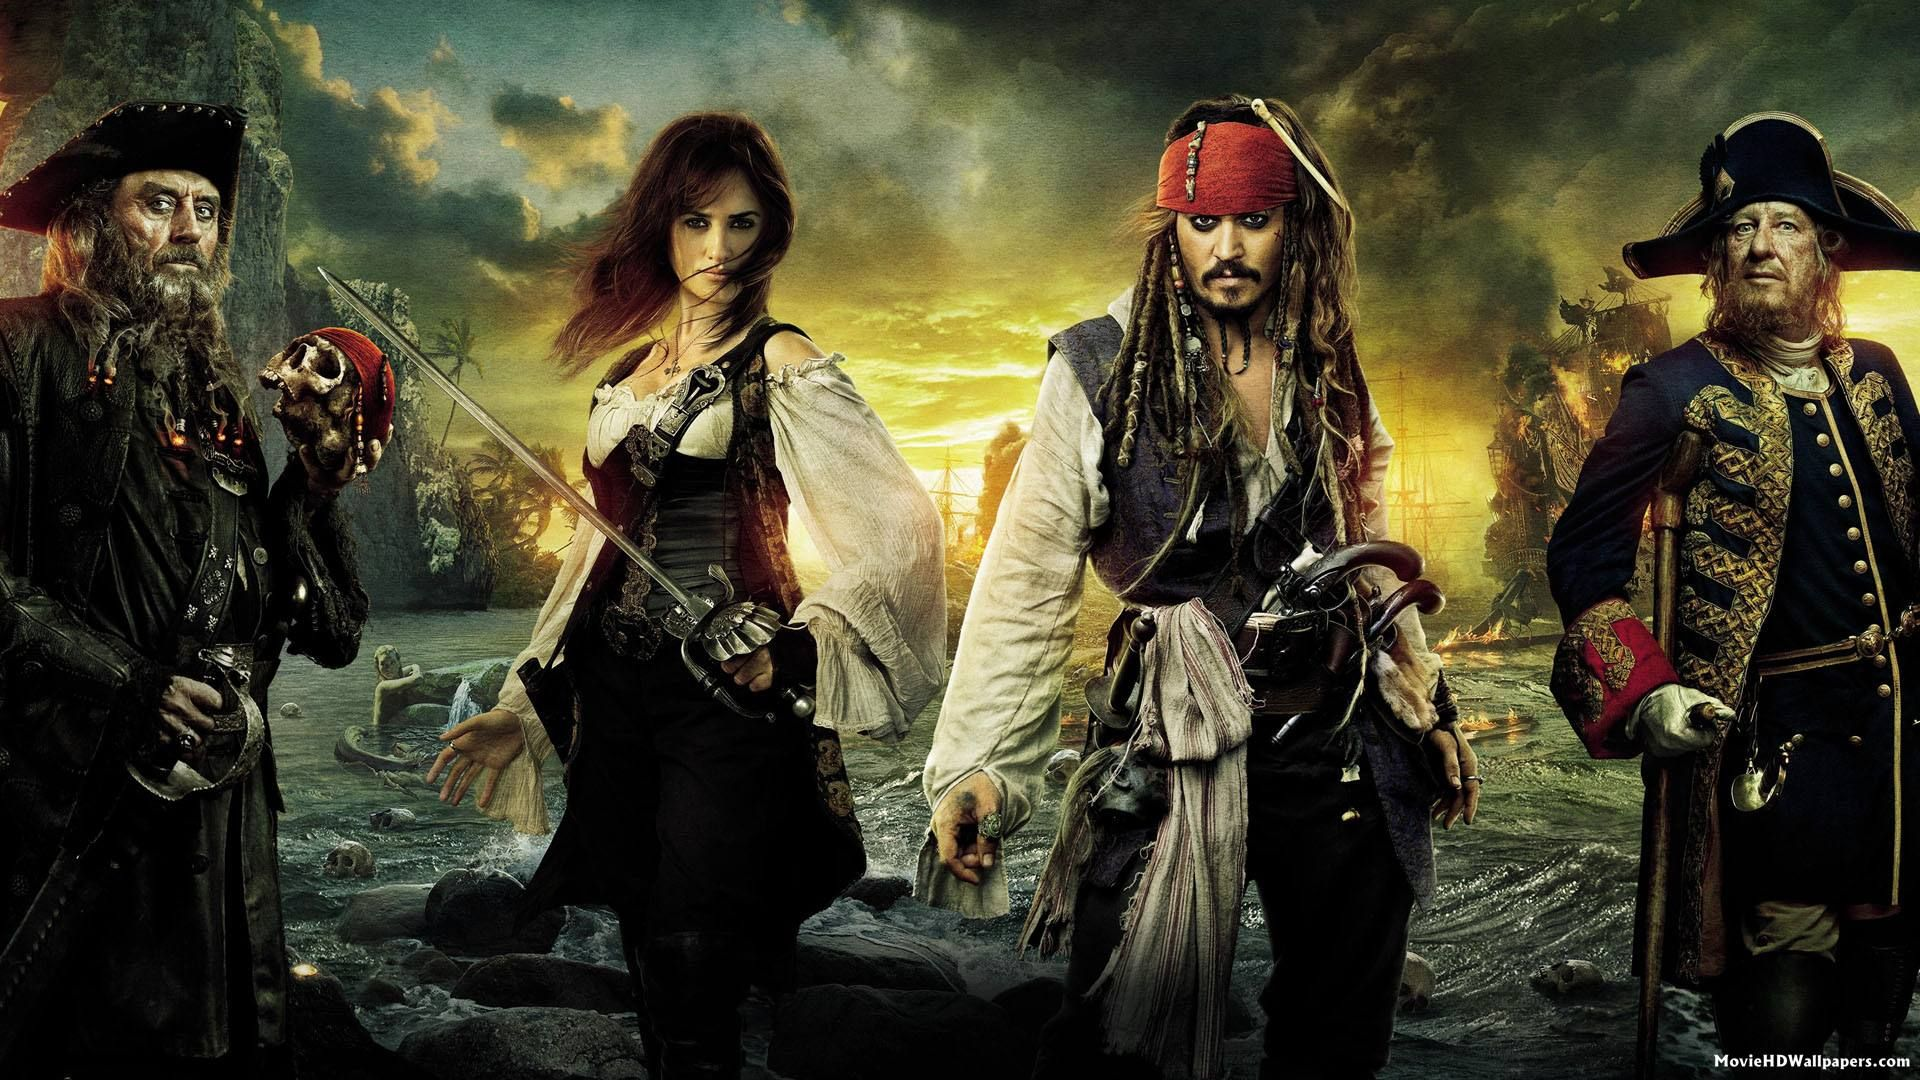 Pirates Of The Caribbean On Stranger Tides 2011 Movie Hd On Stranger Tides Pirates Of The Caribbean Captain Jack Sparrow